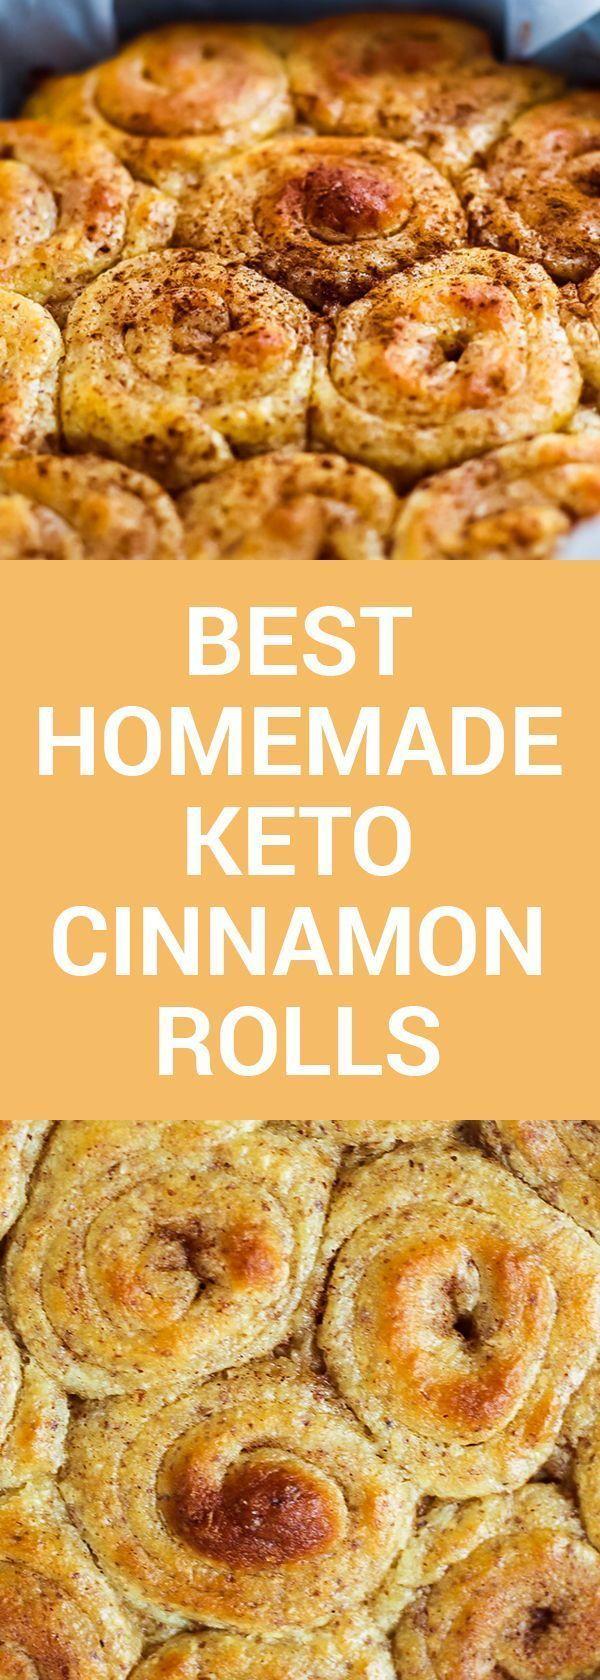 Best Homemade Keto Cinnamon Rolls #planningyourday